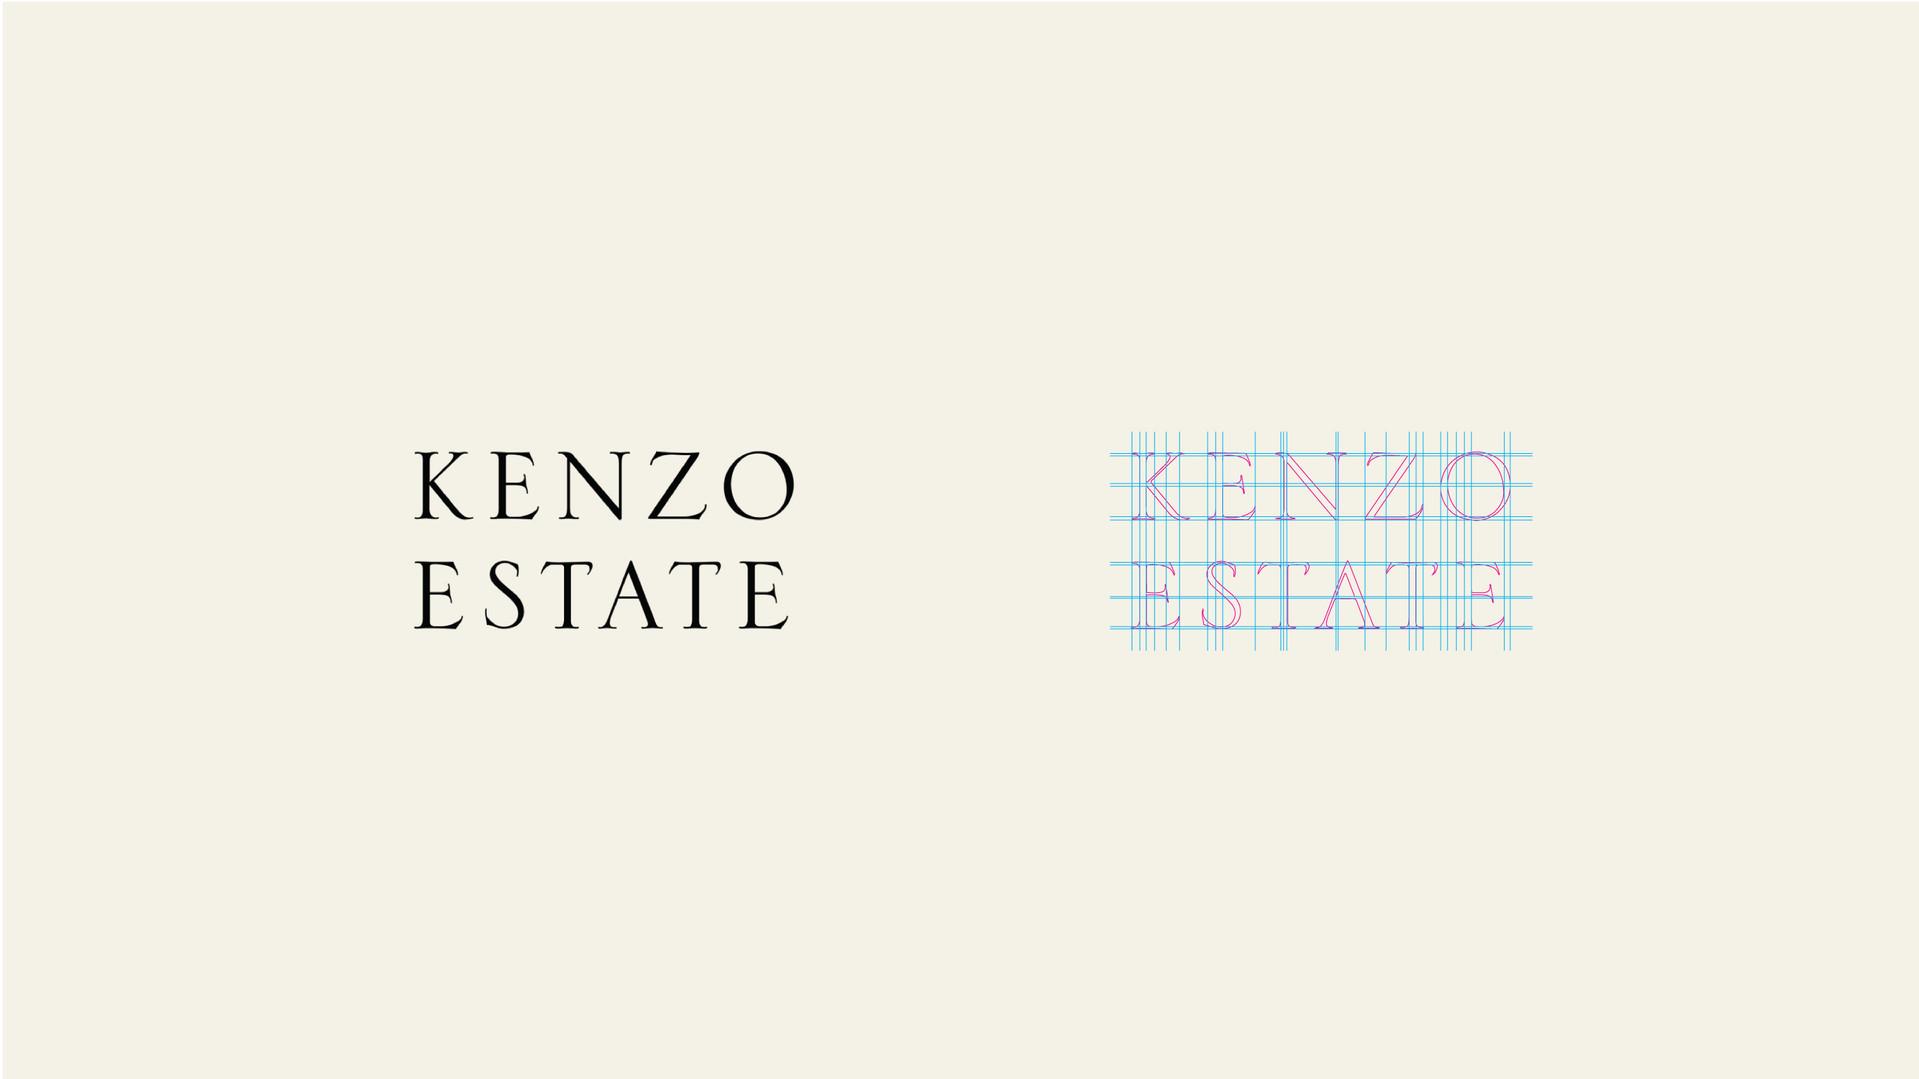 kenzoestate.com